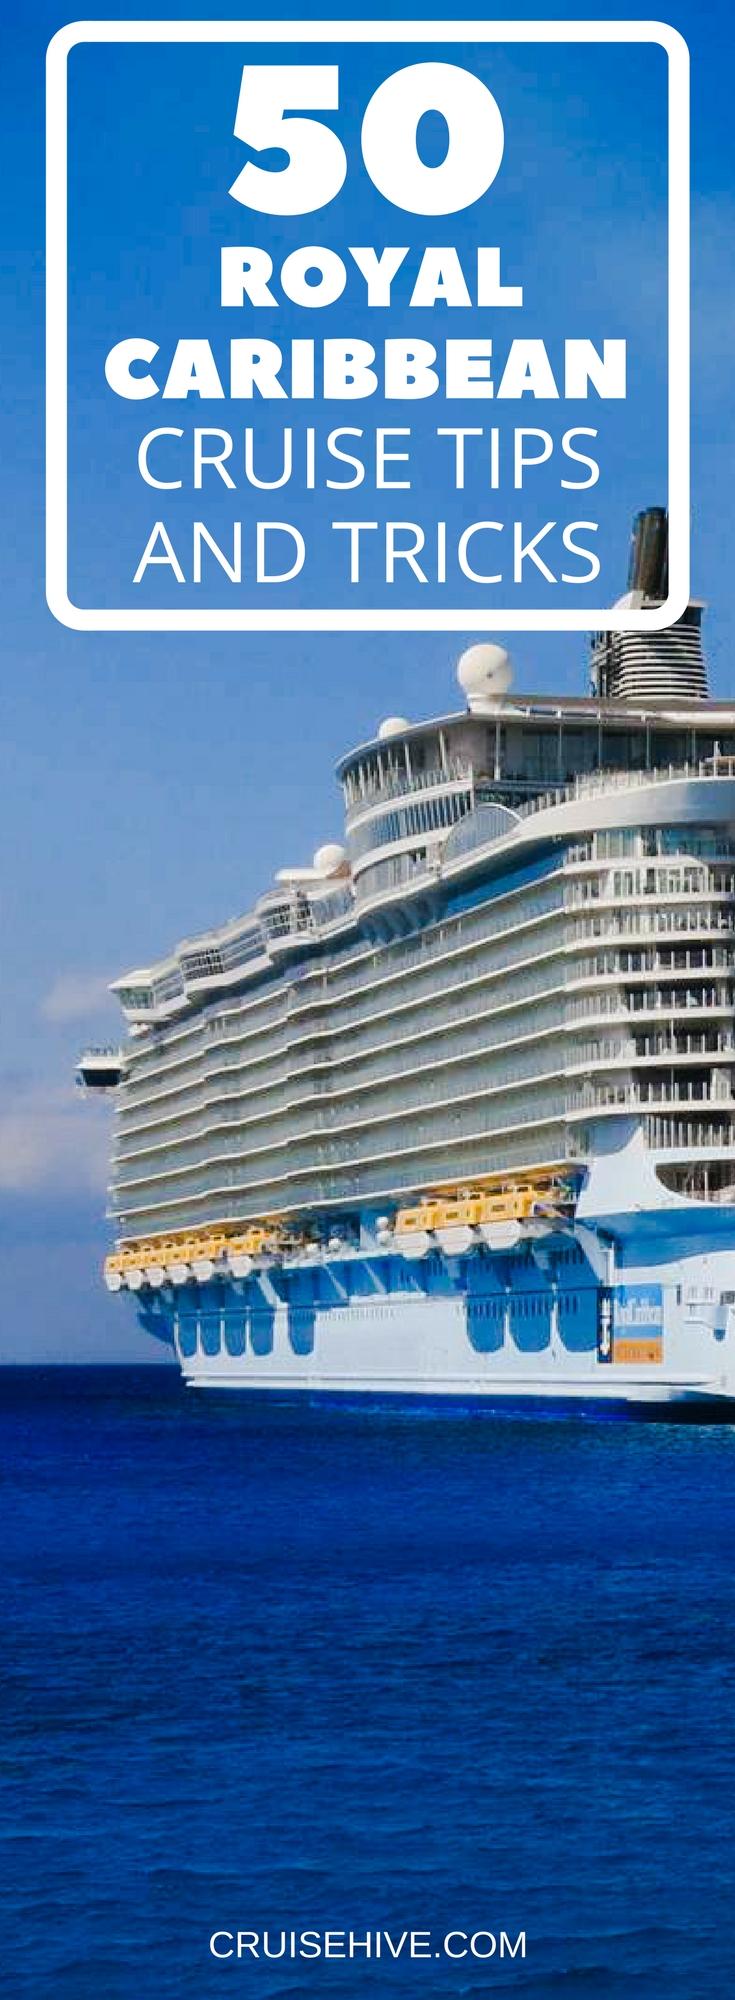 Royal Caribbean Cruise Tips And Tricks - Cruise ship tricks